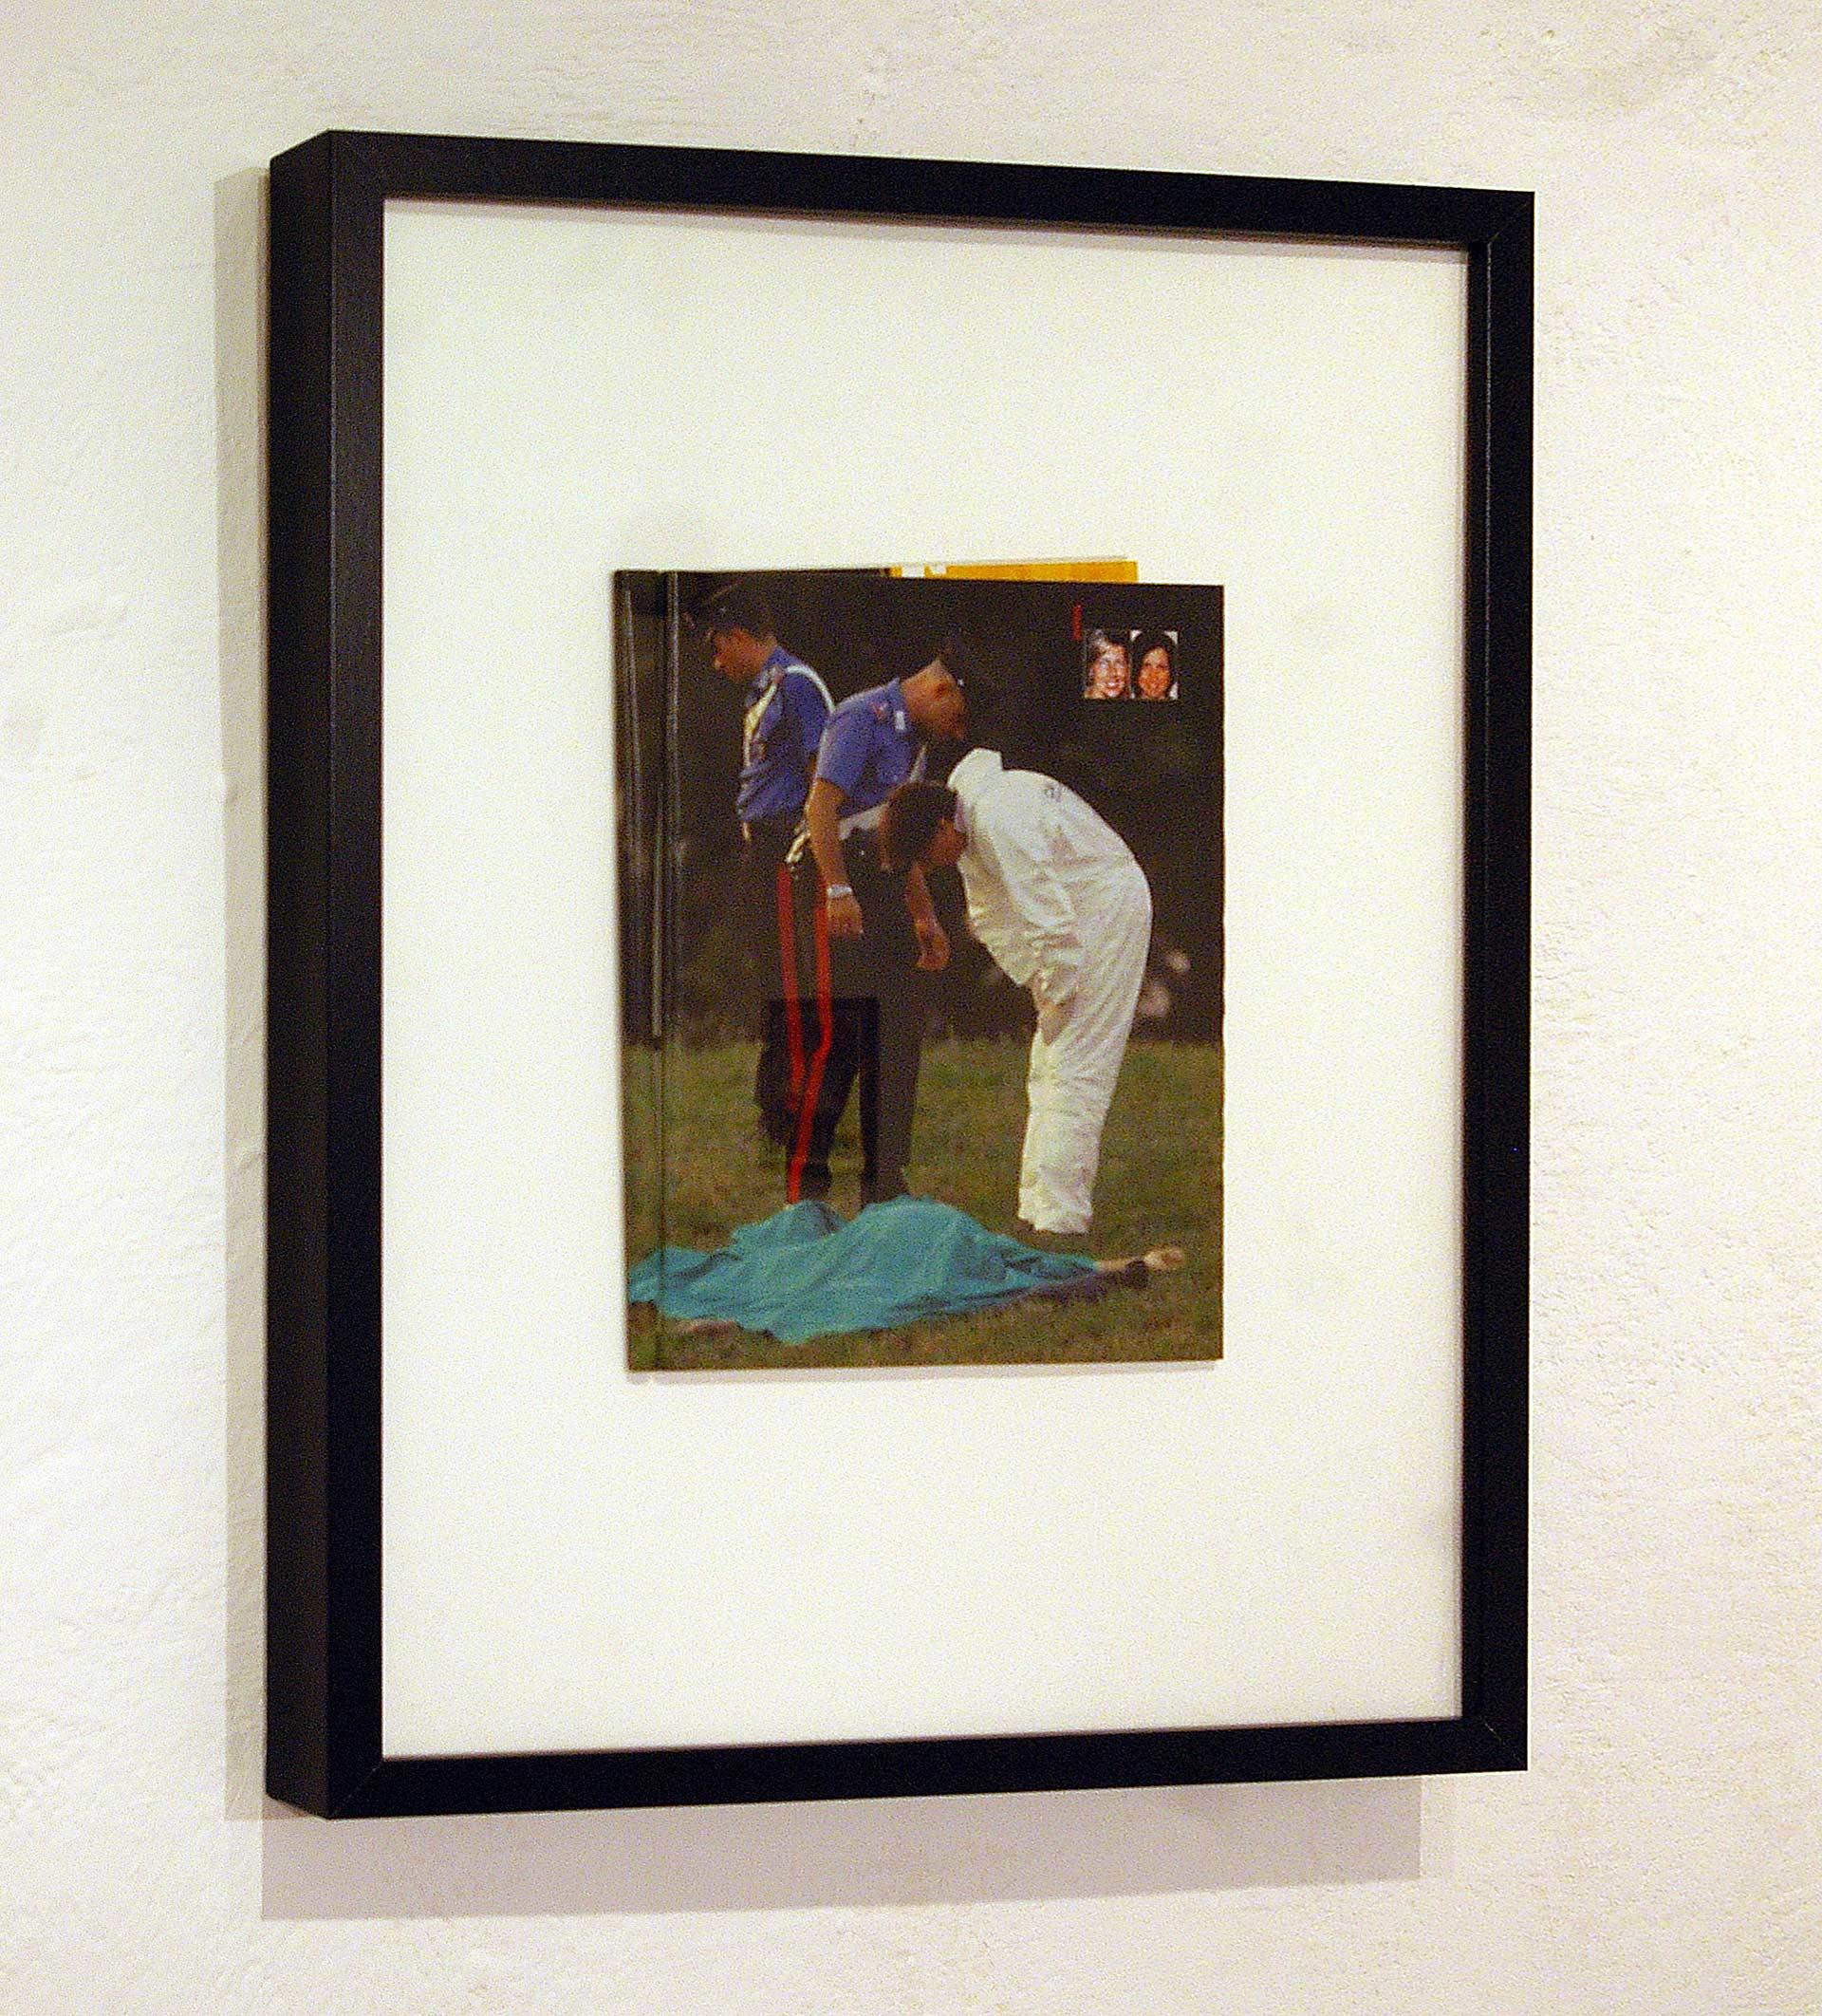 UP1007 2010, acrylic on magazine, framed, 50 x 40 cm.